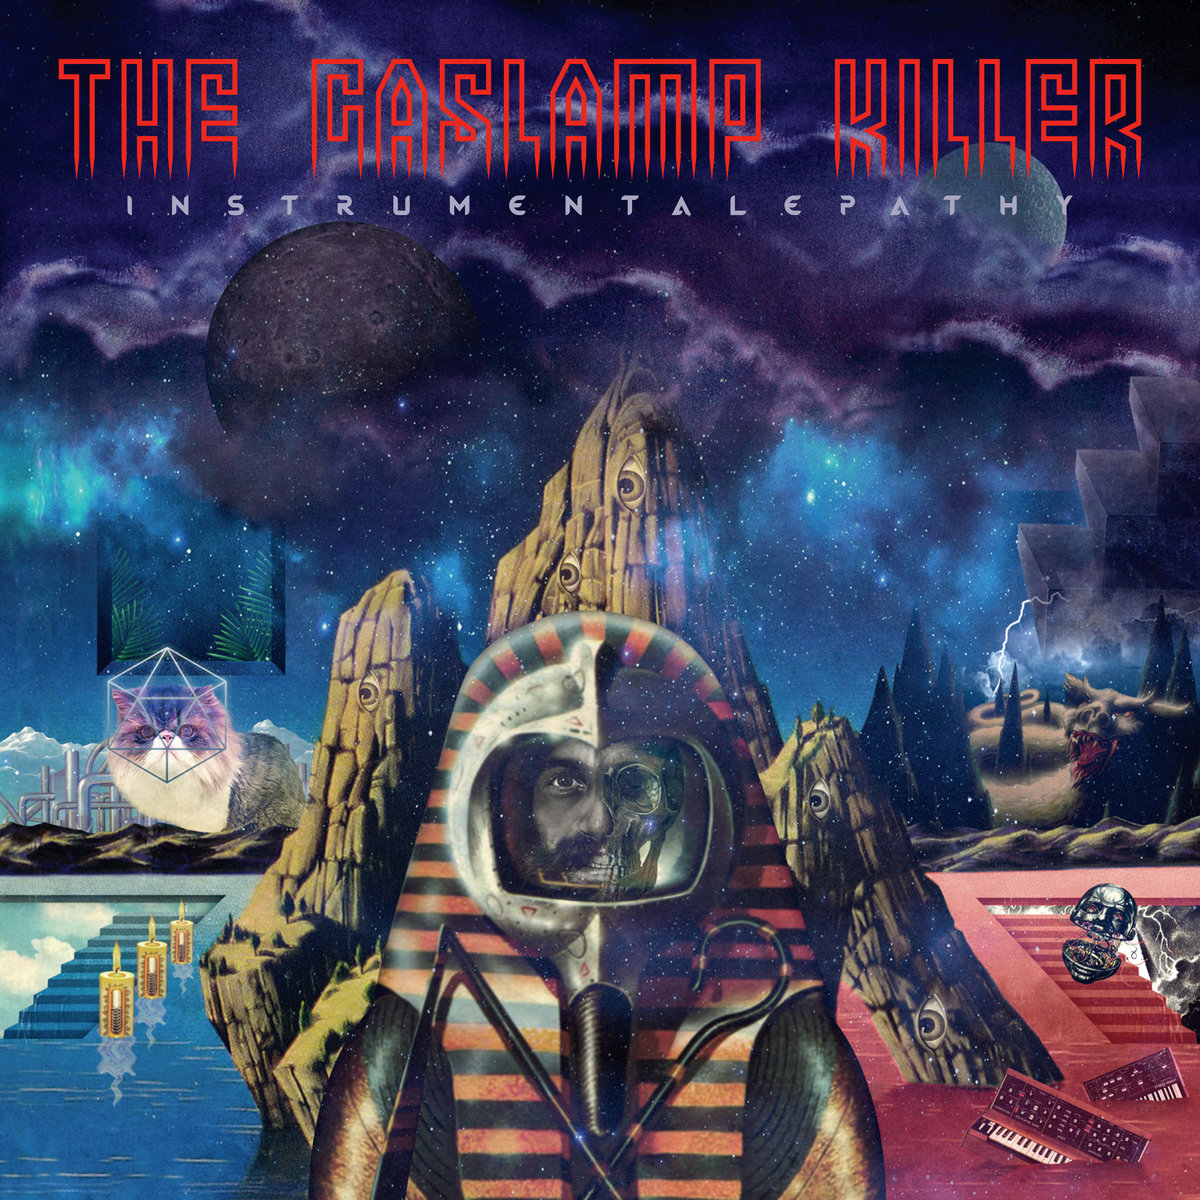 The Gaslamp Killer - Instrumentalepathy (Cuss) $23.99